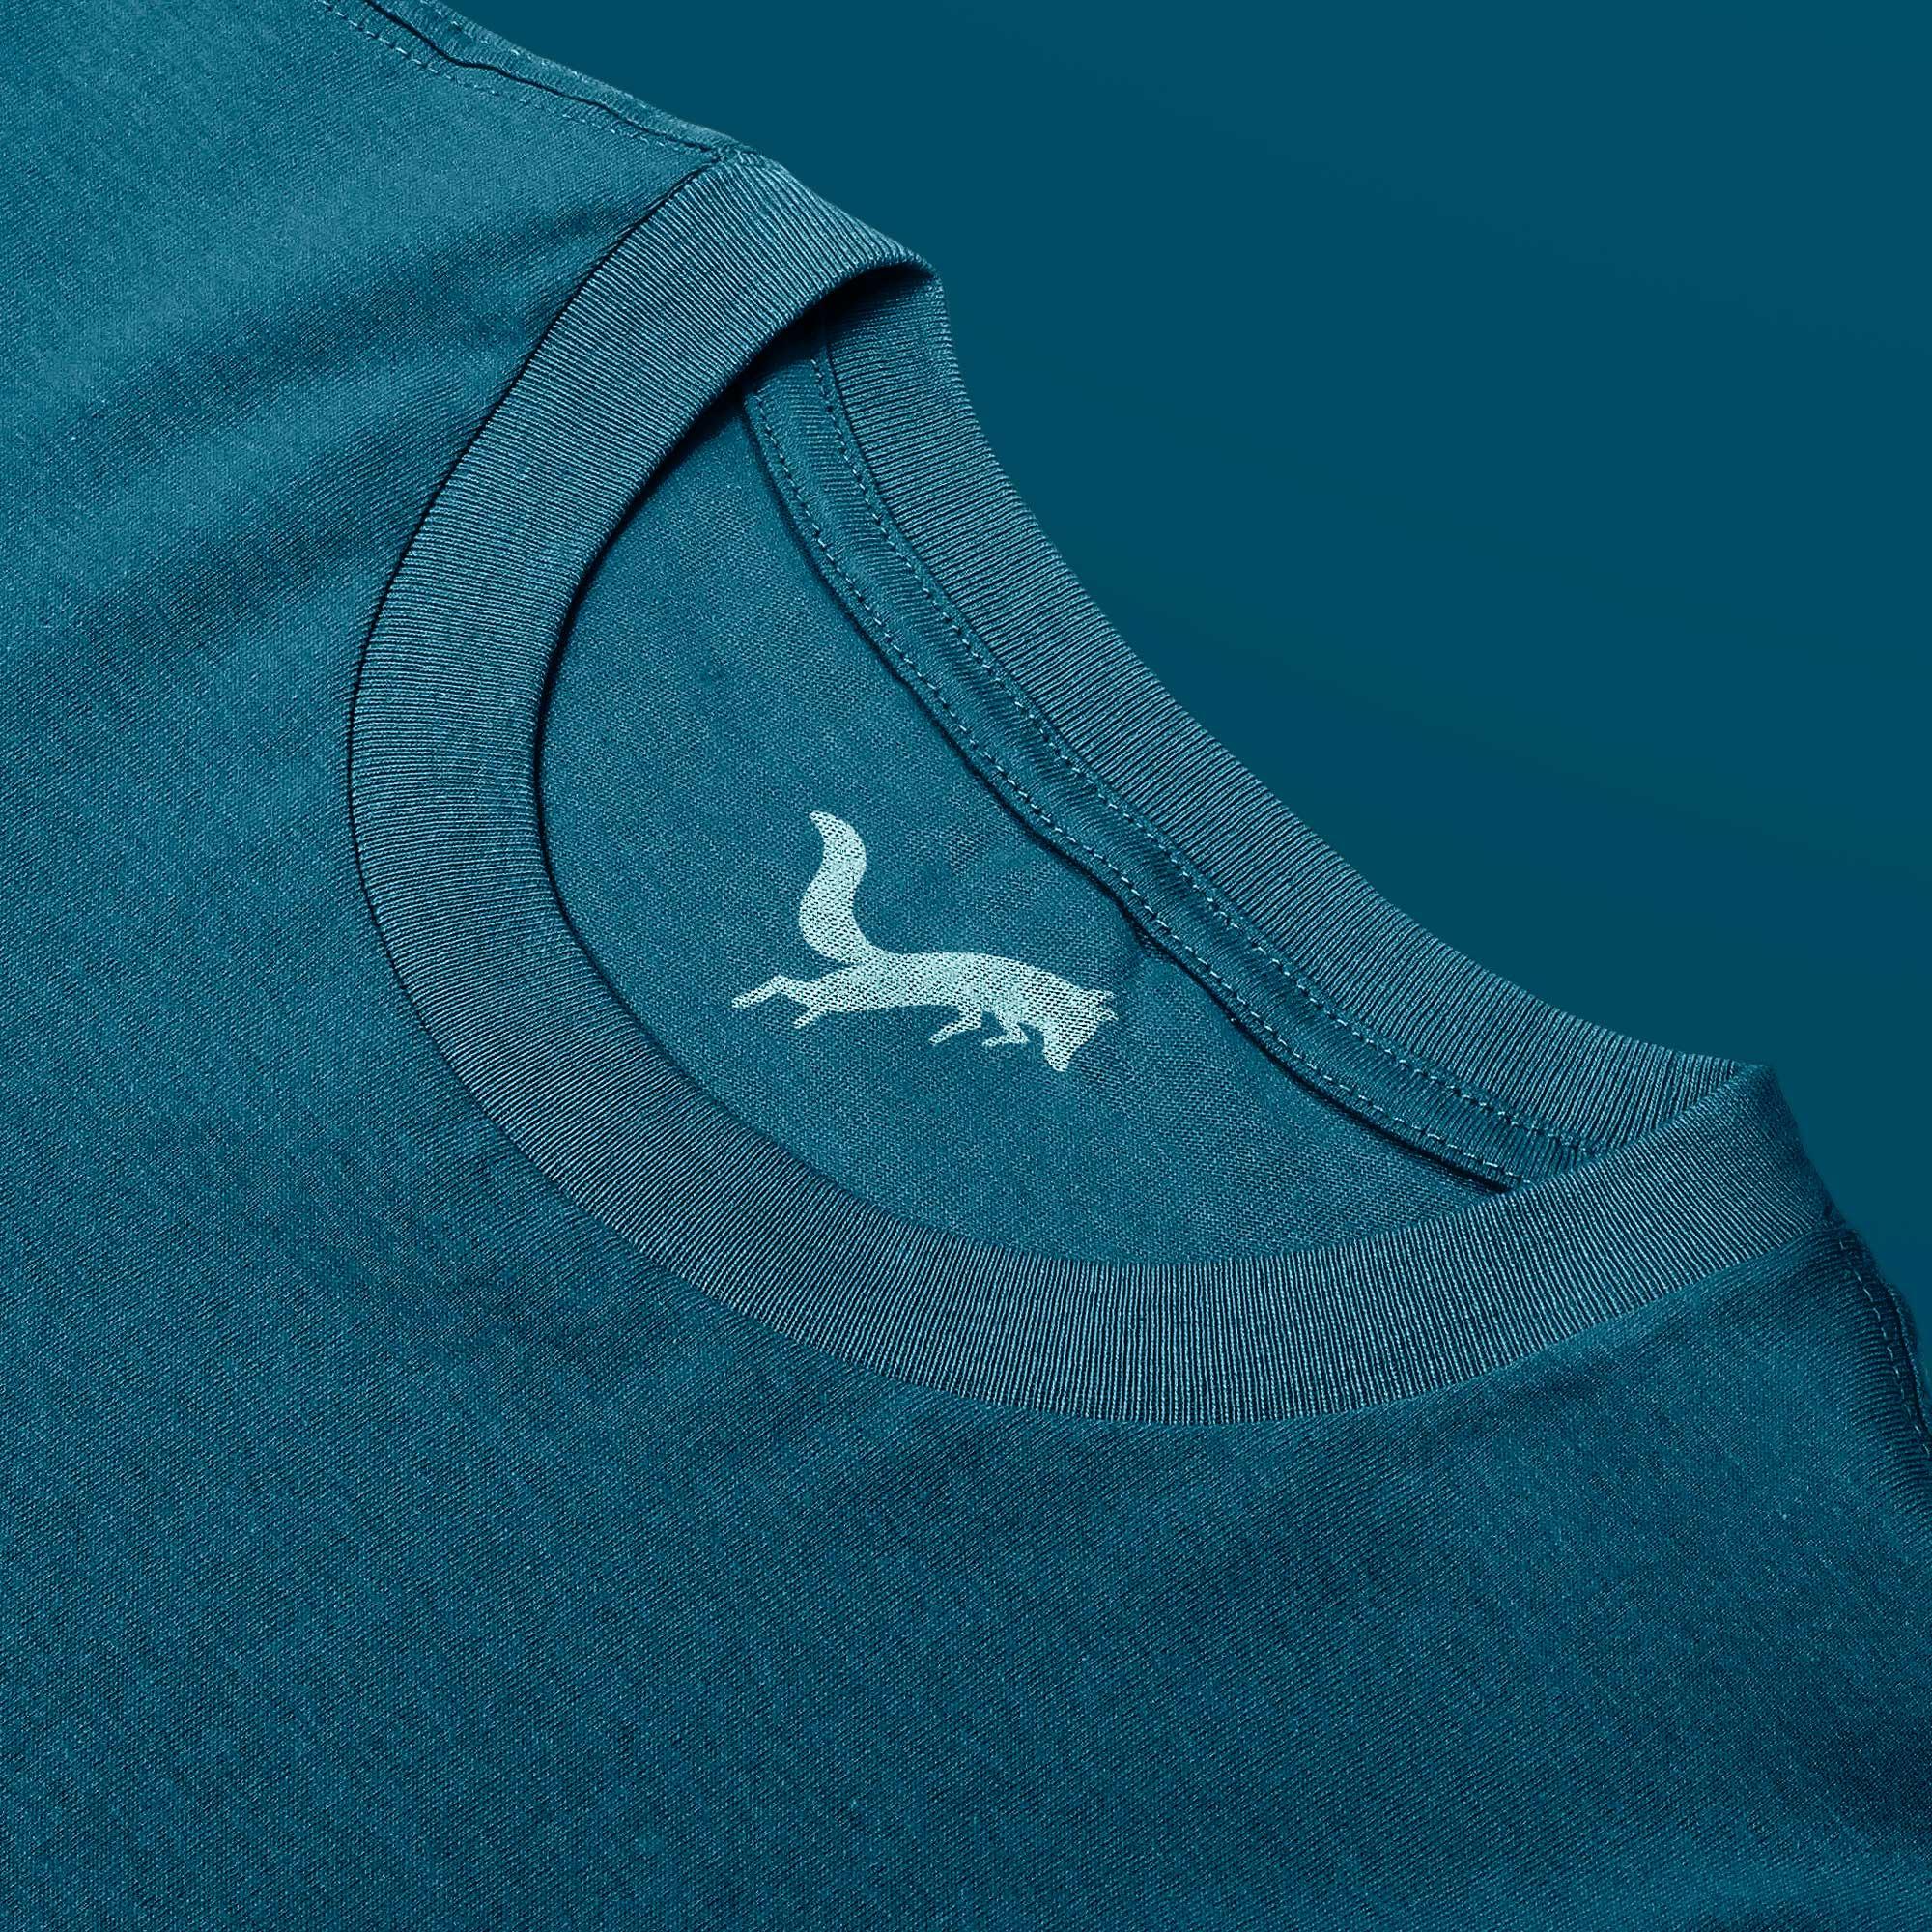 Hunter Gatherer Garment Label